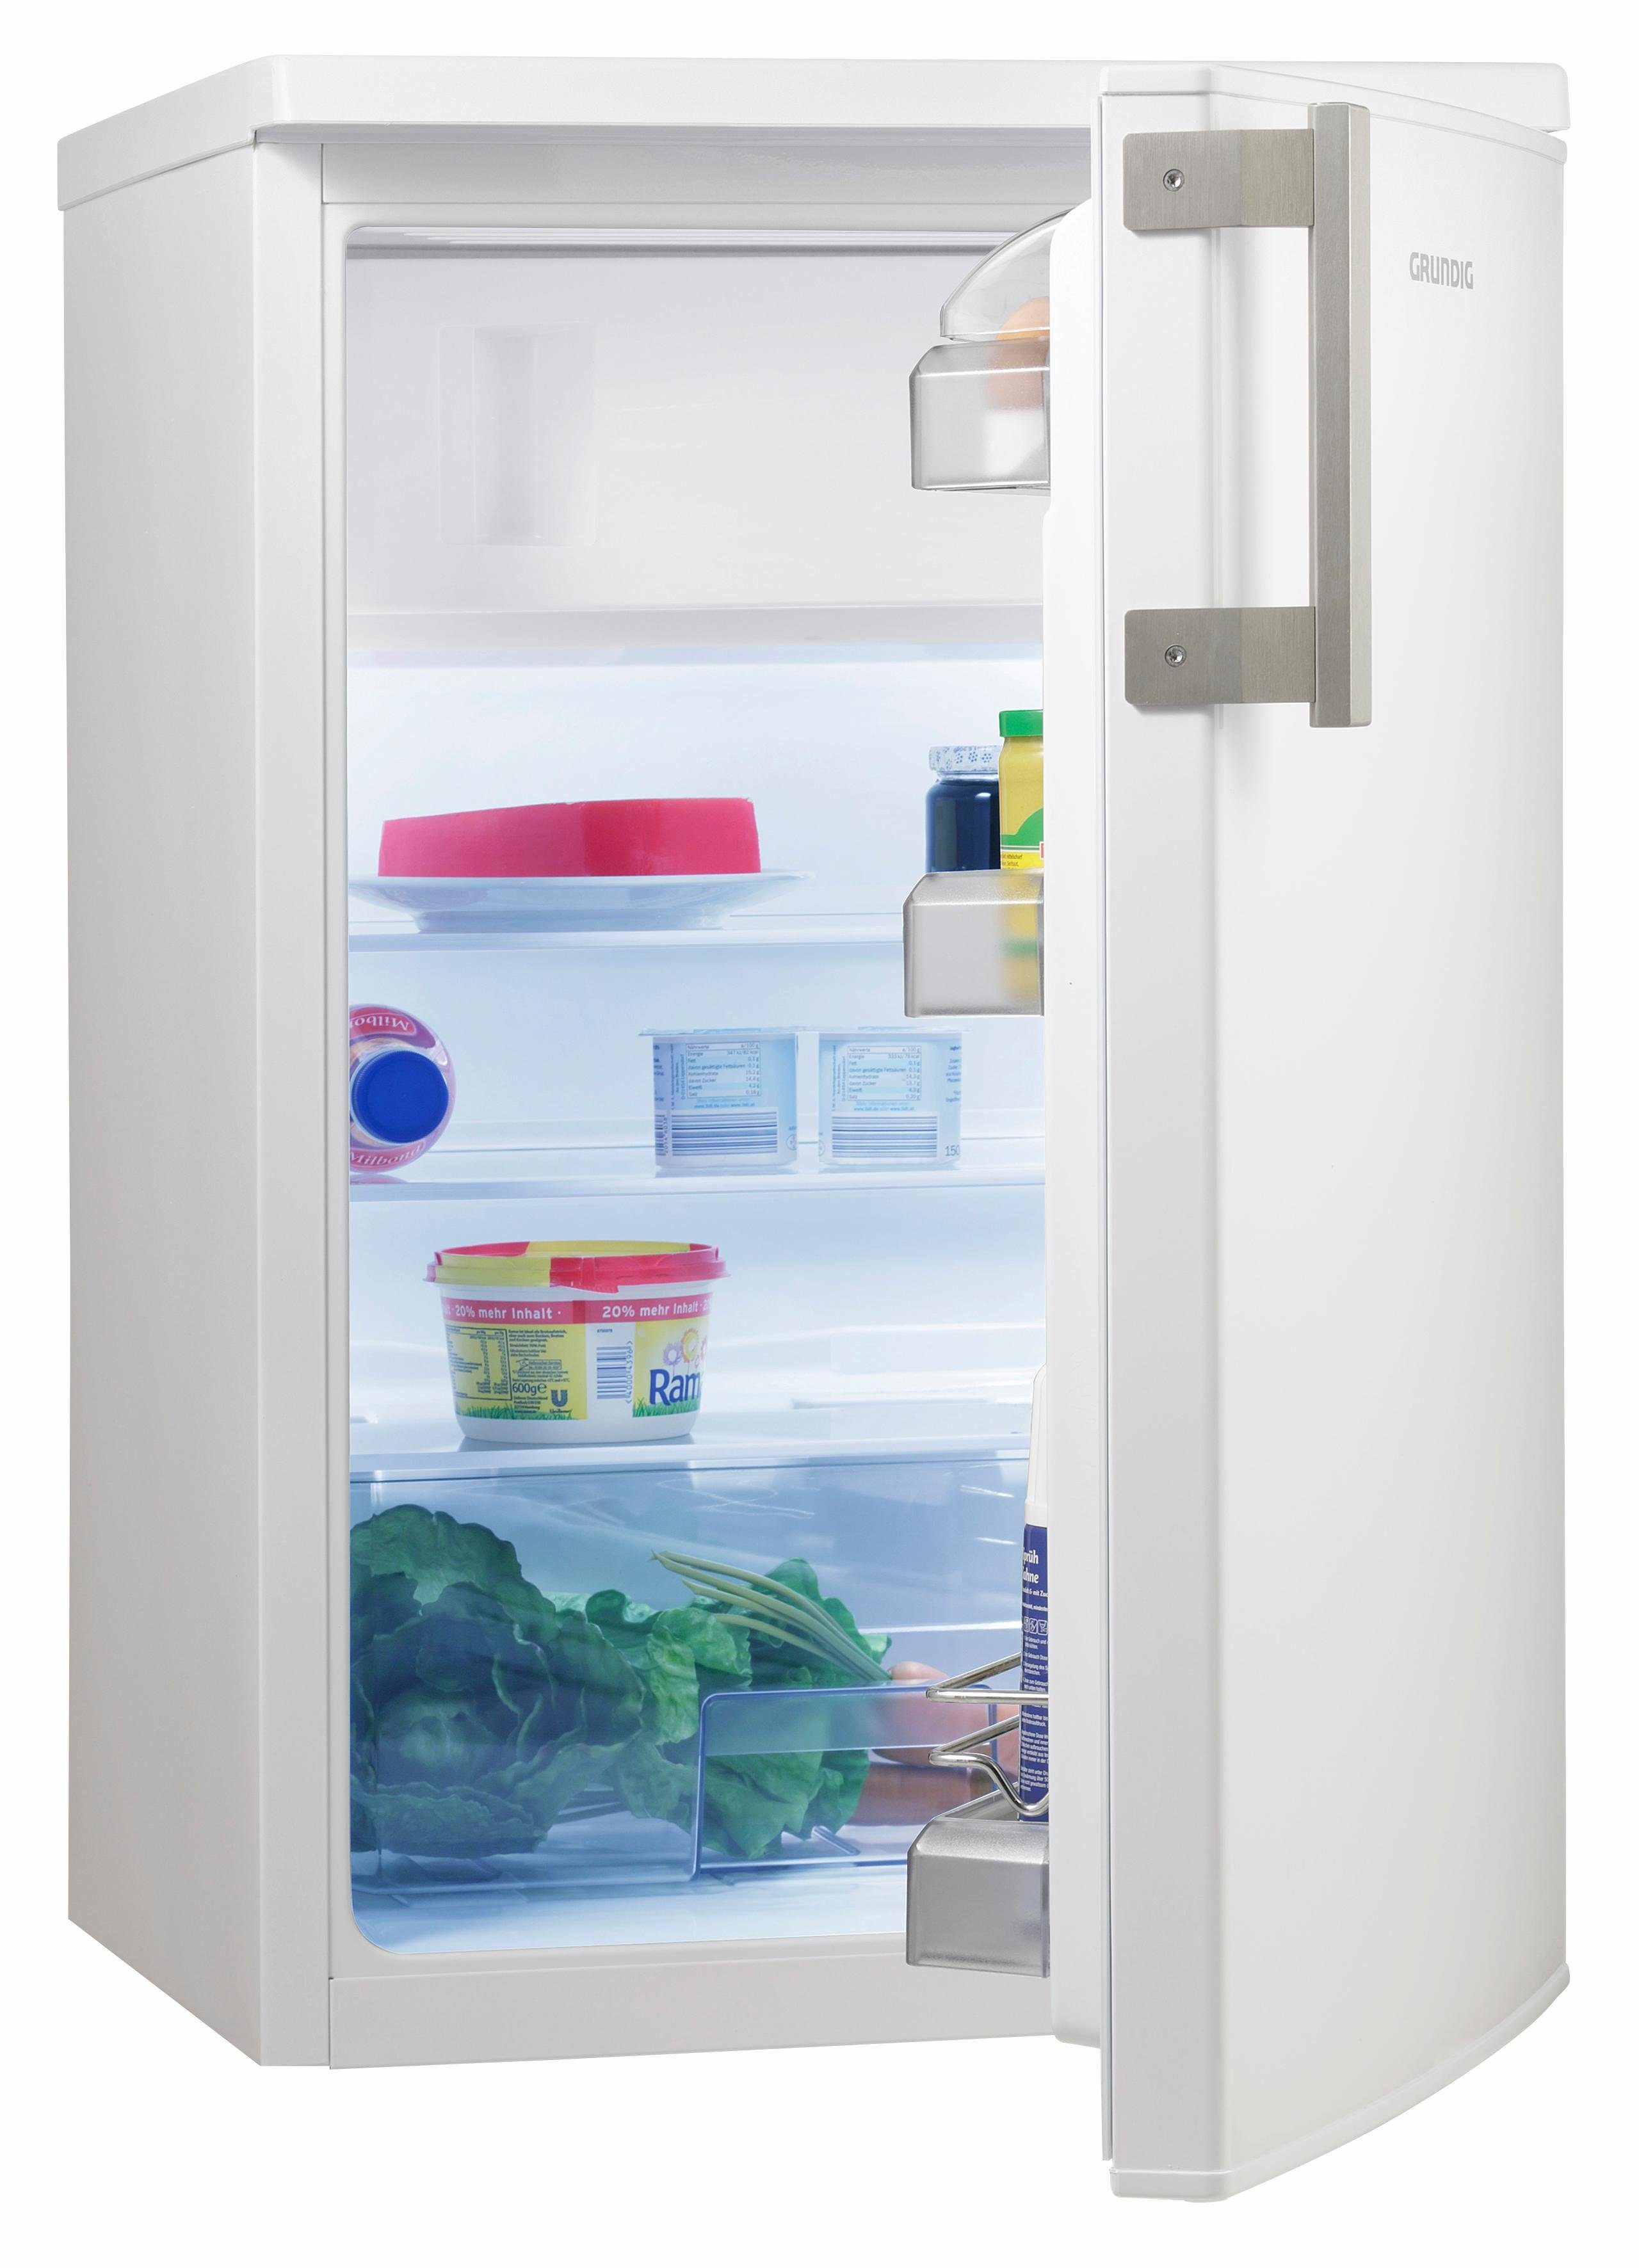 Grundig Kühlschrank GTM 14120, A++, 84 cm hoch